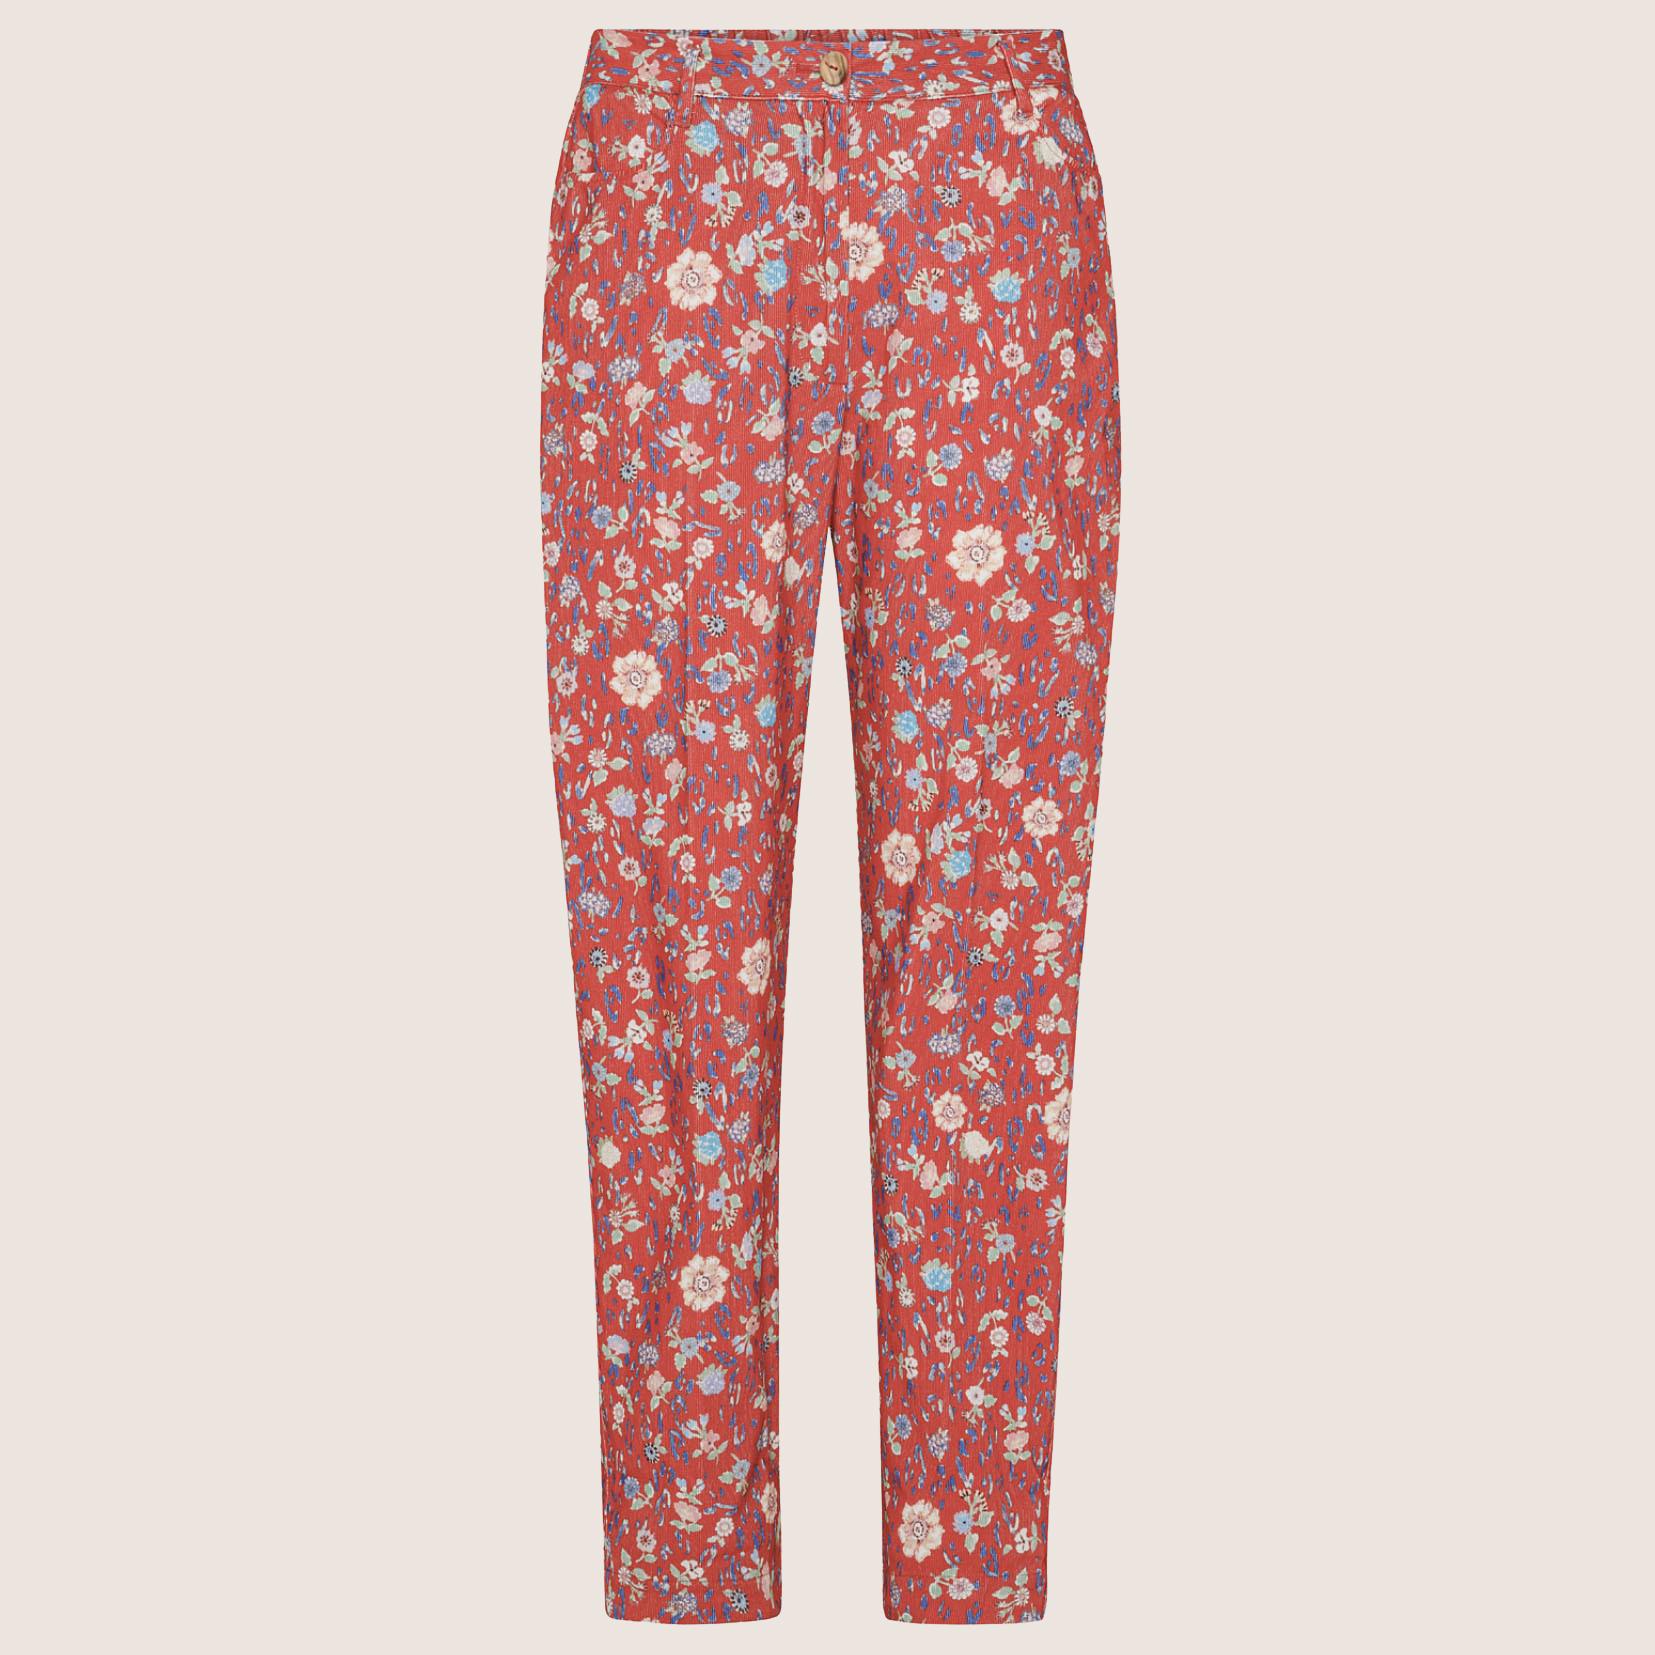 Velvet Trousers With Print